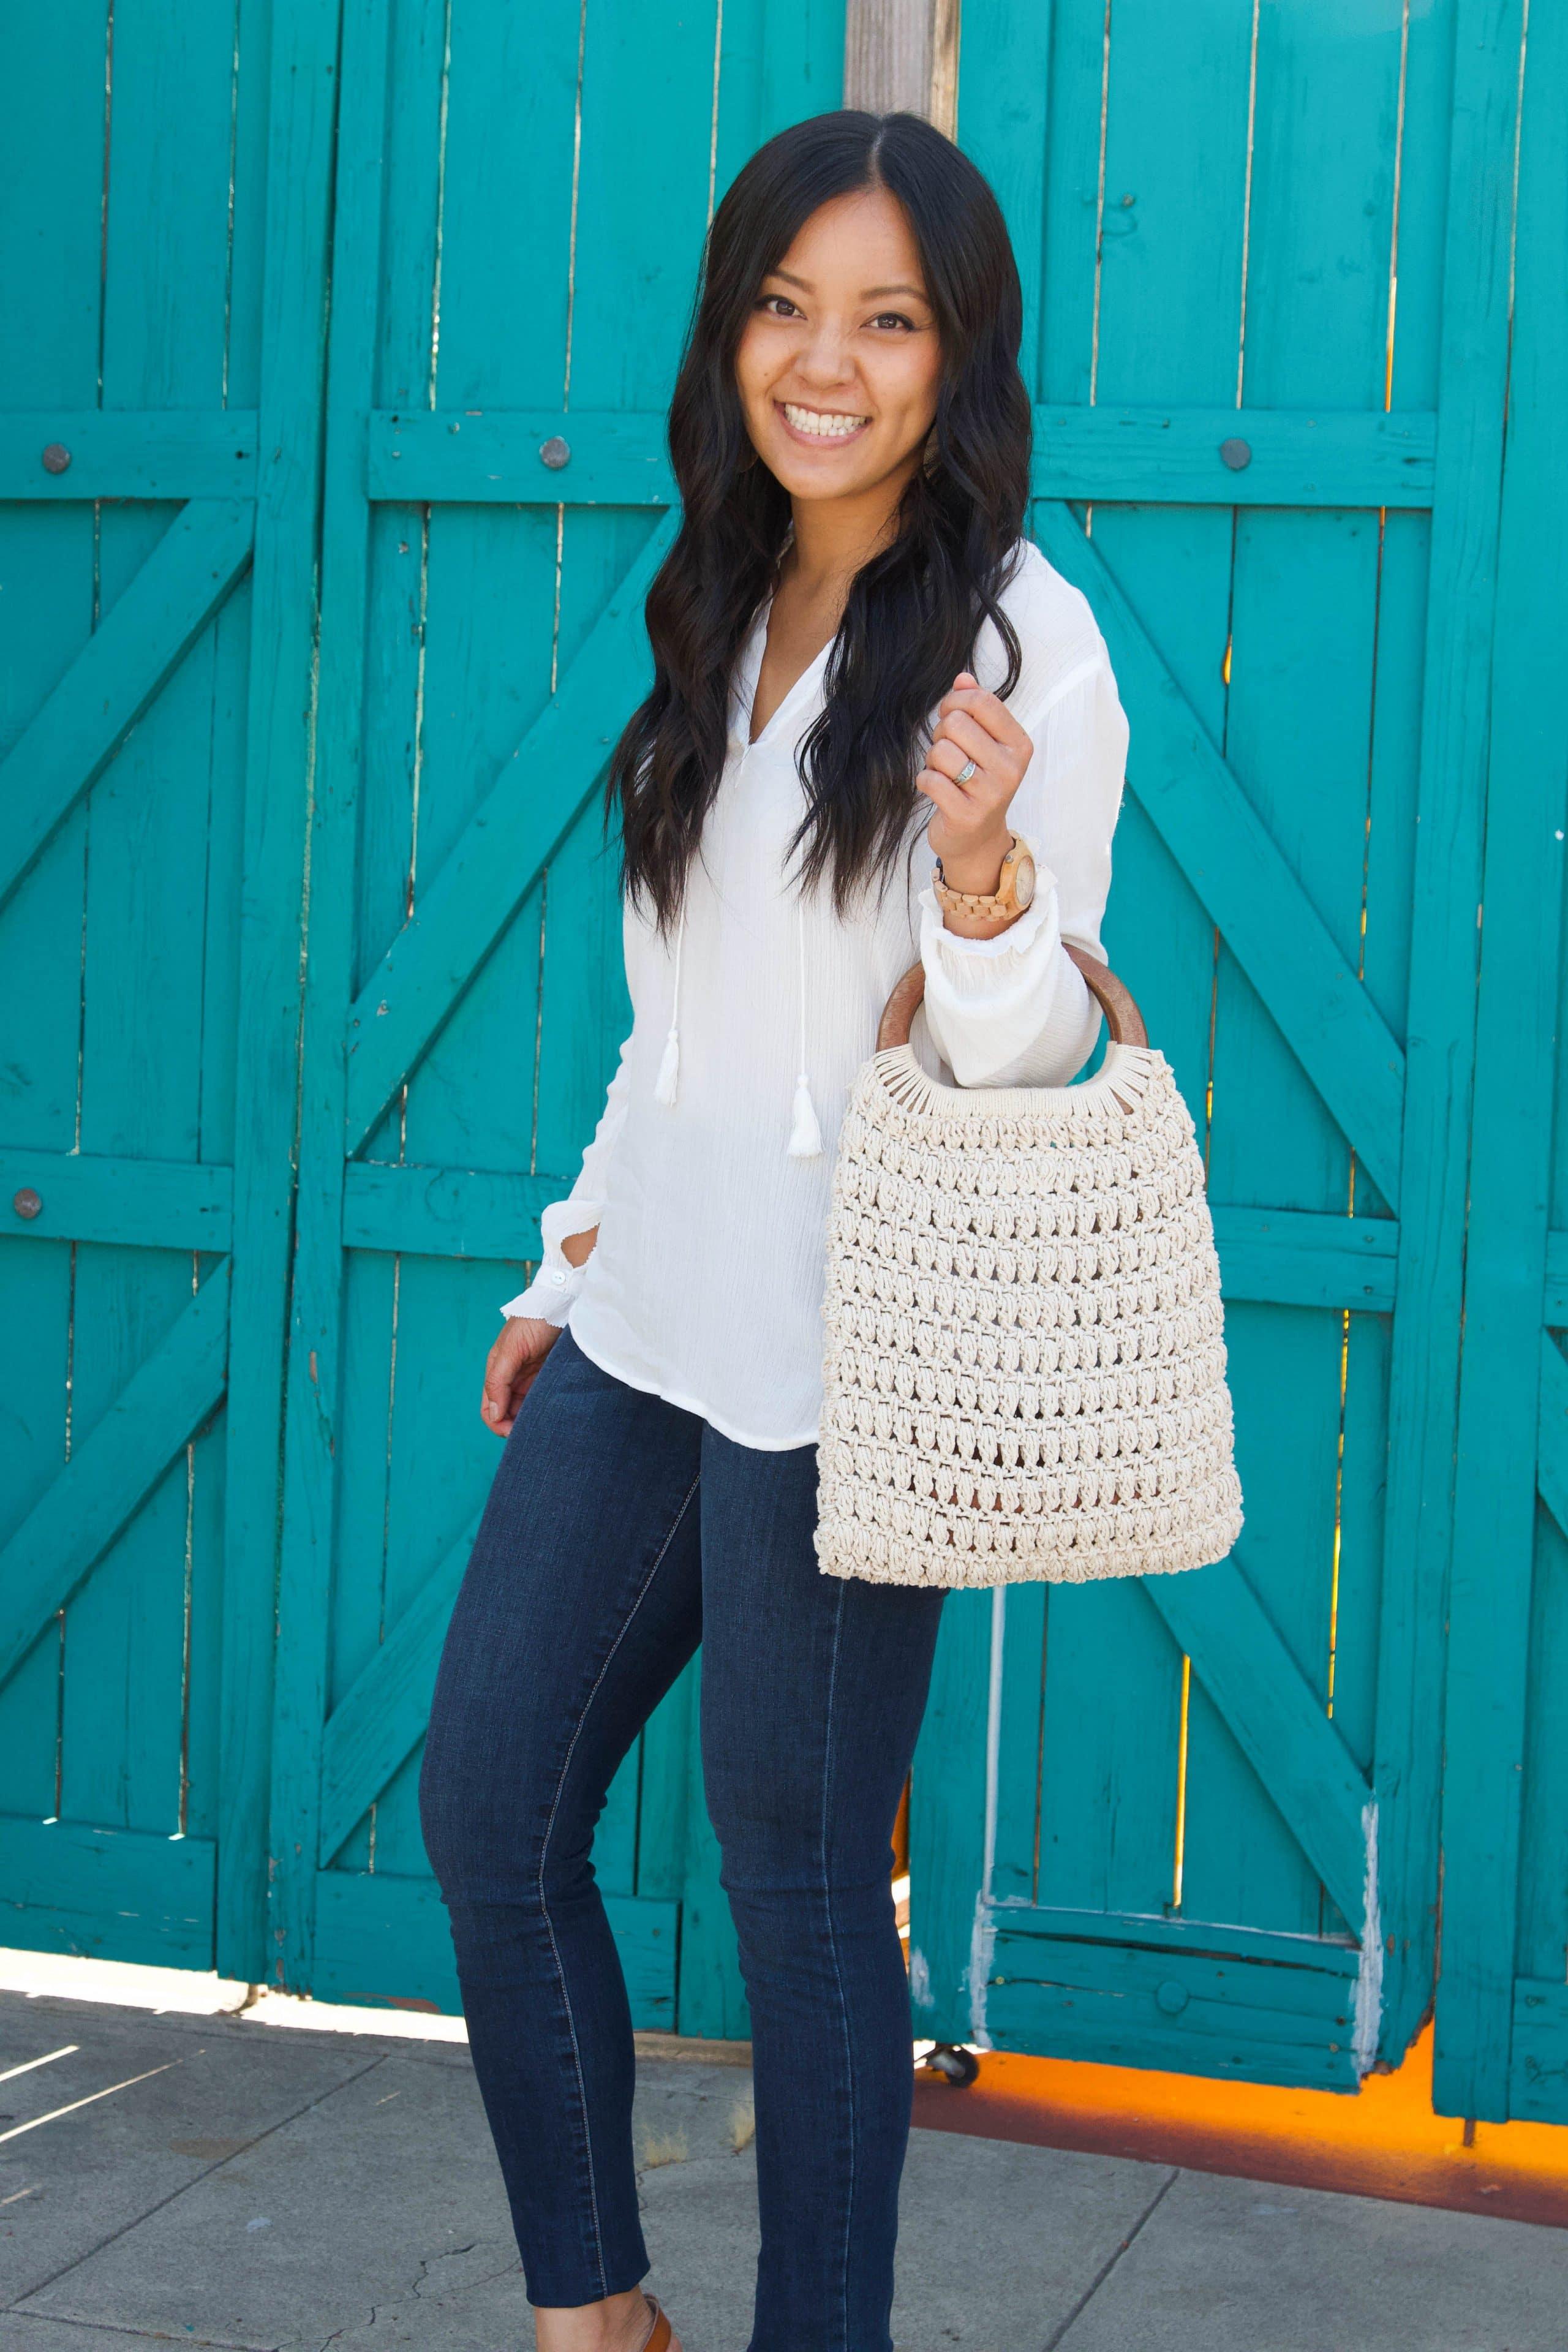 white macrame handbag + jeans + white blouse